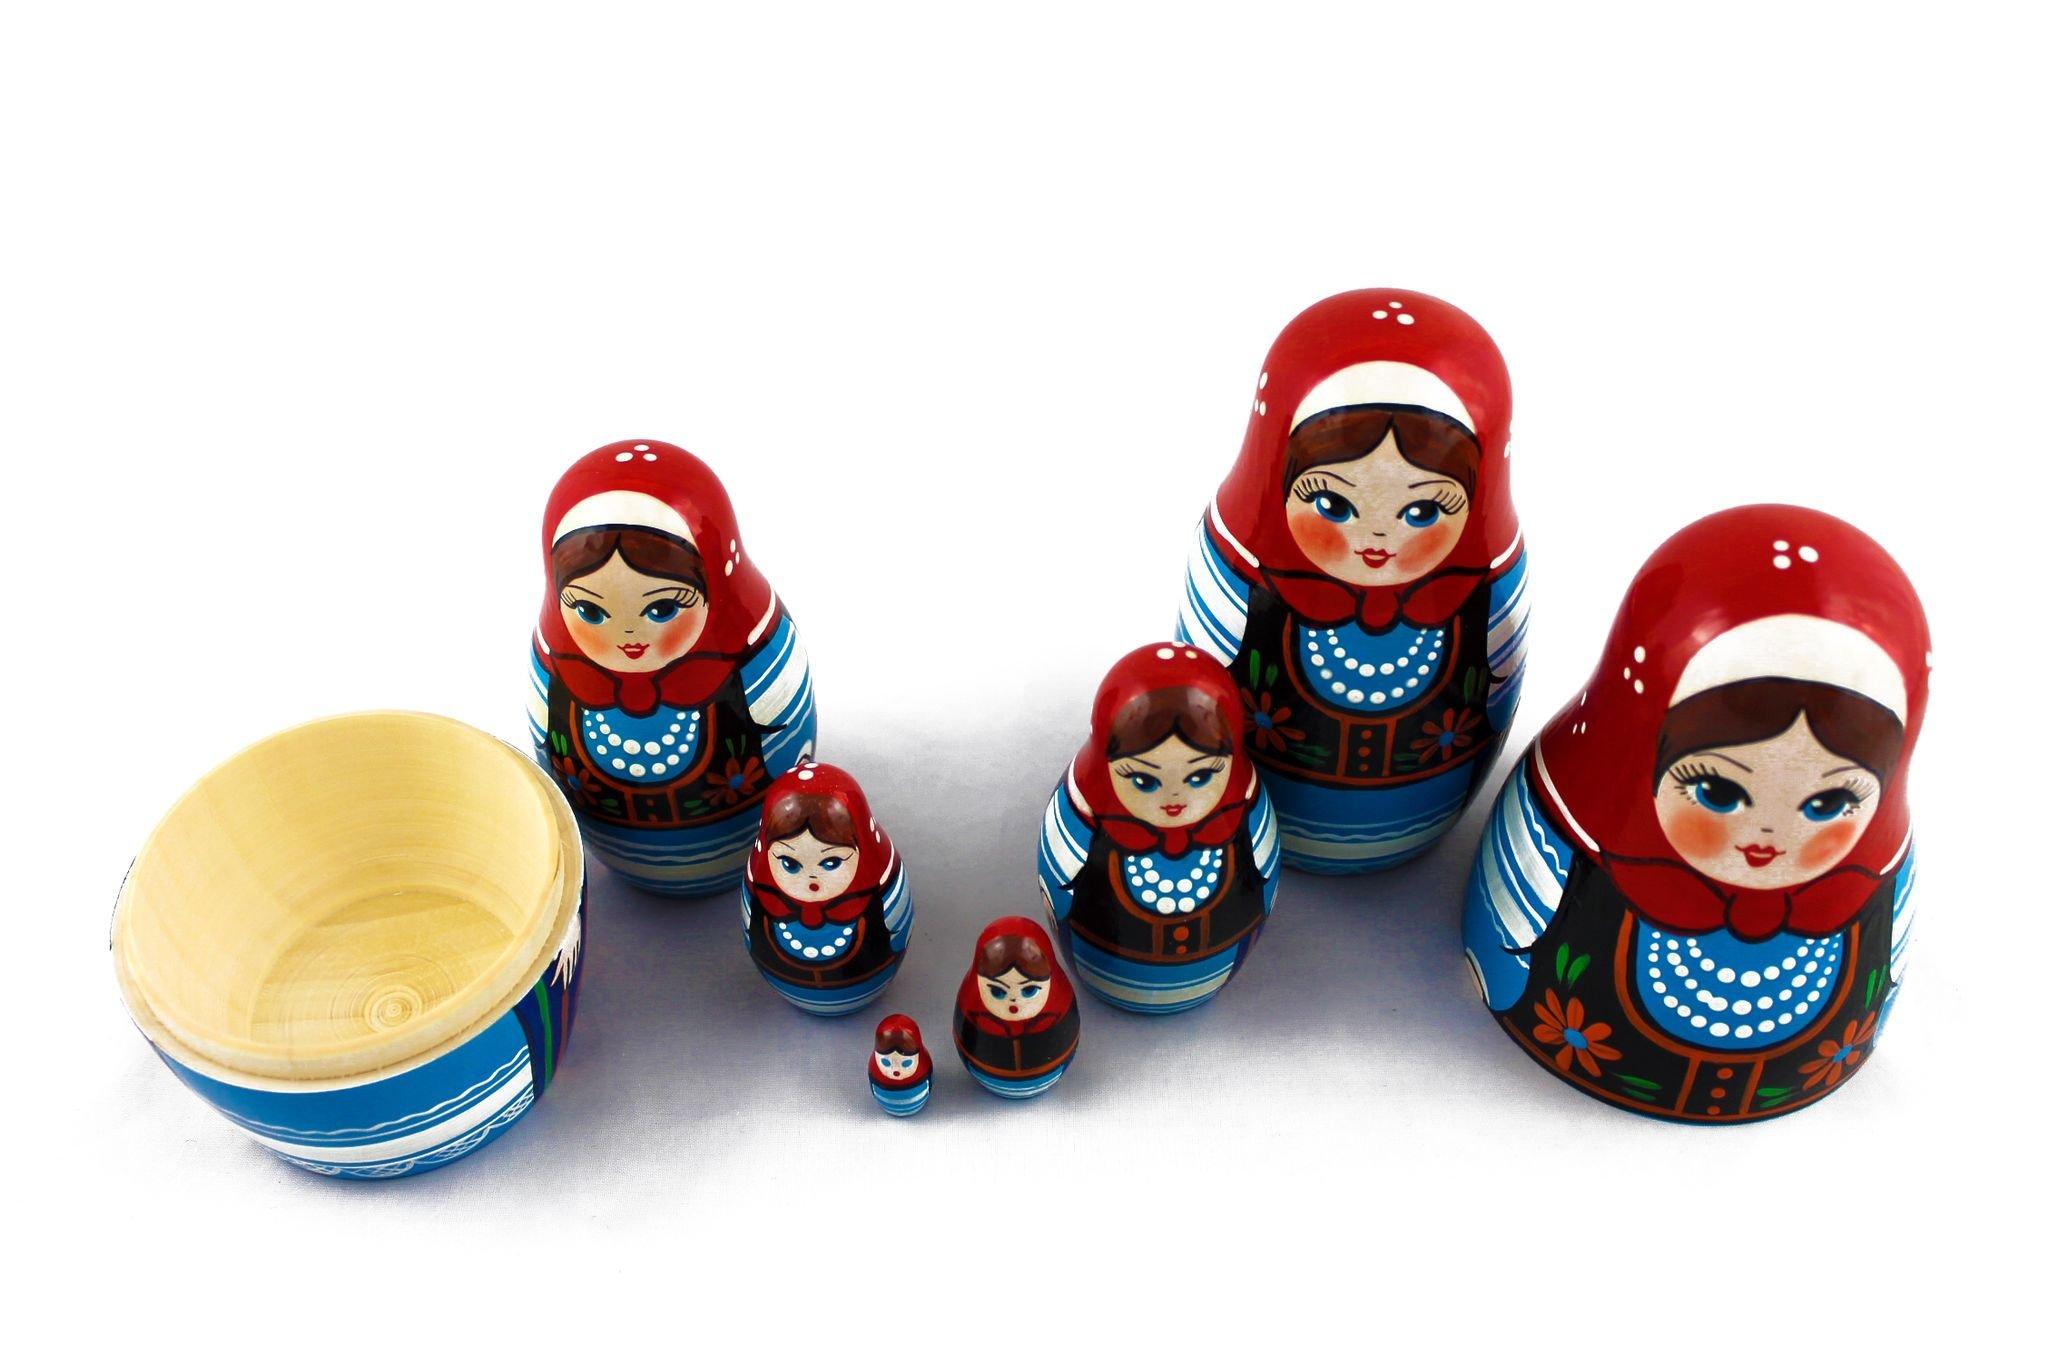 Matryoshka Polish National Dress Babushka Russian Nesting Wooden Stacking Doll 7 Pcs by MATRYOSHKA&HANDICRAFT (Image #7)